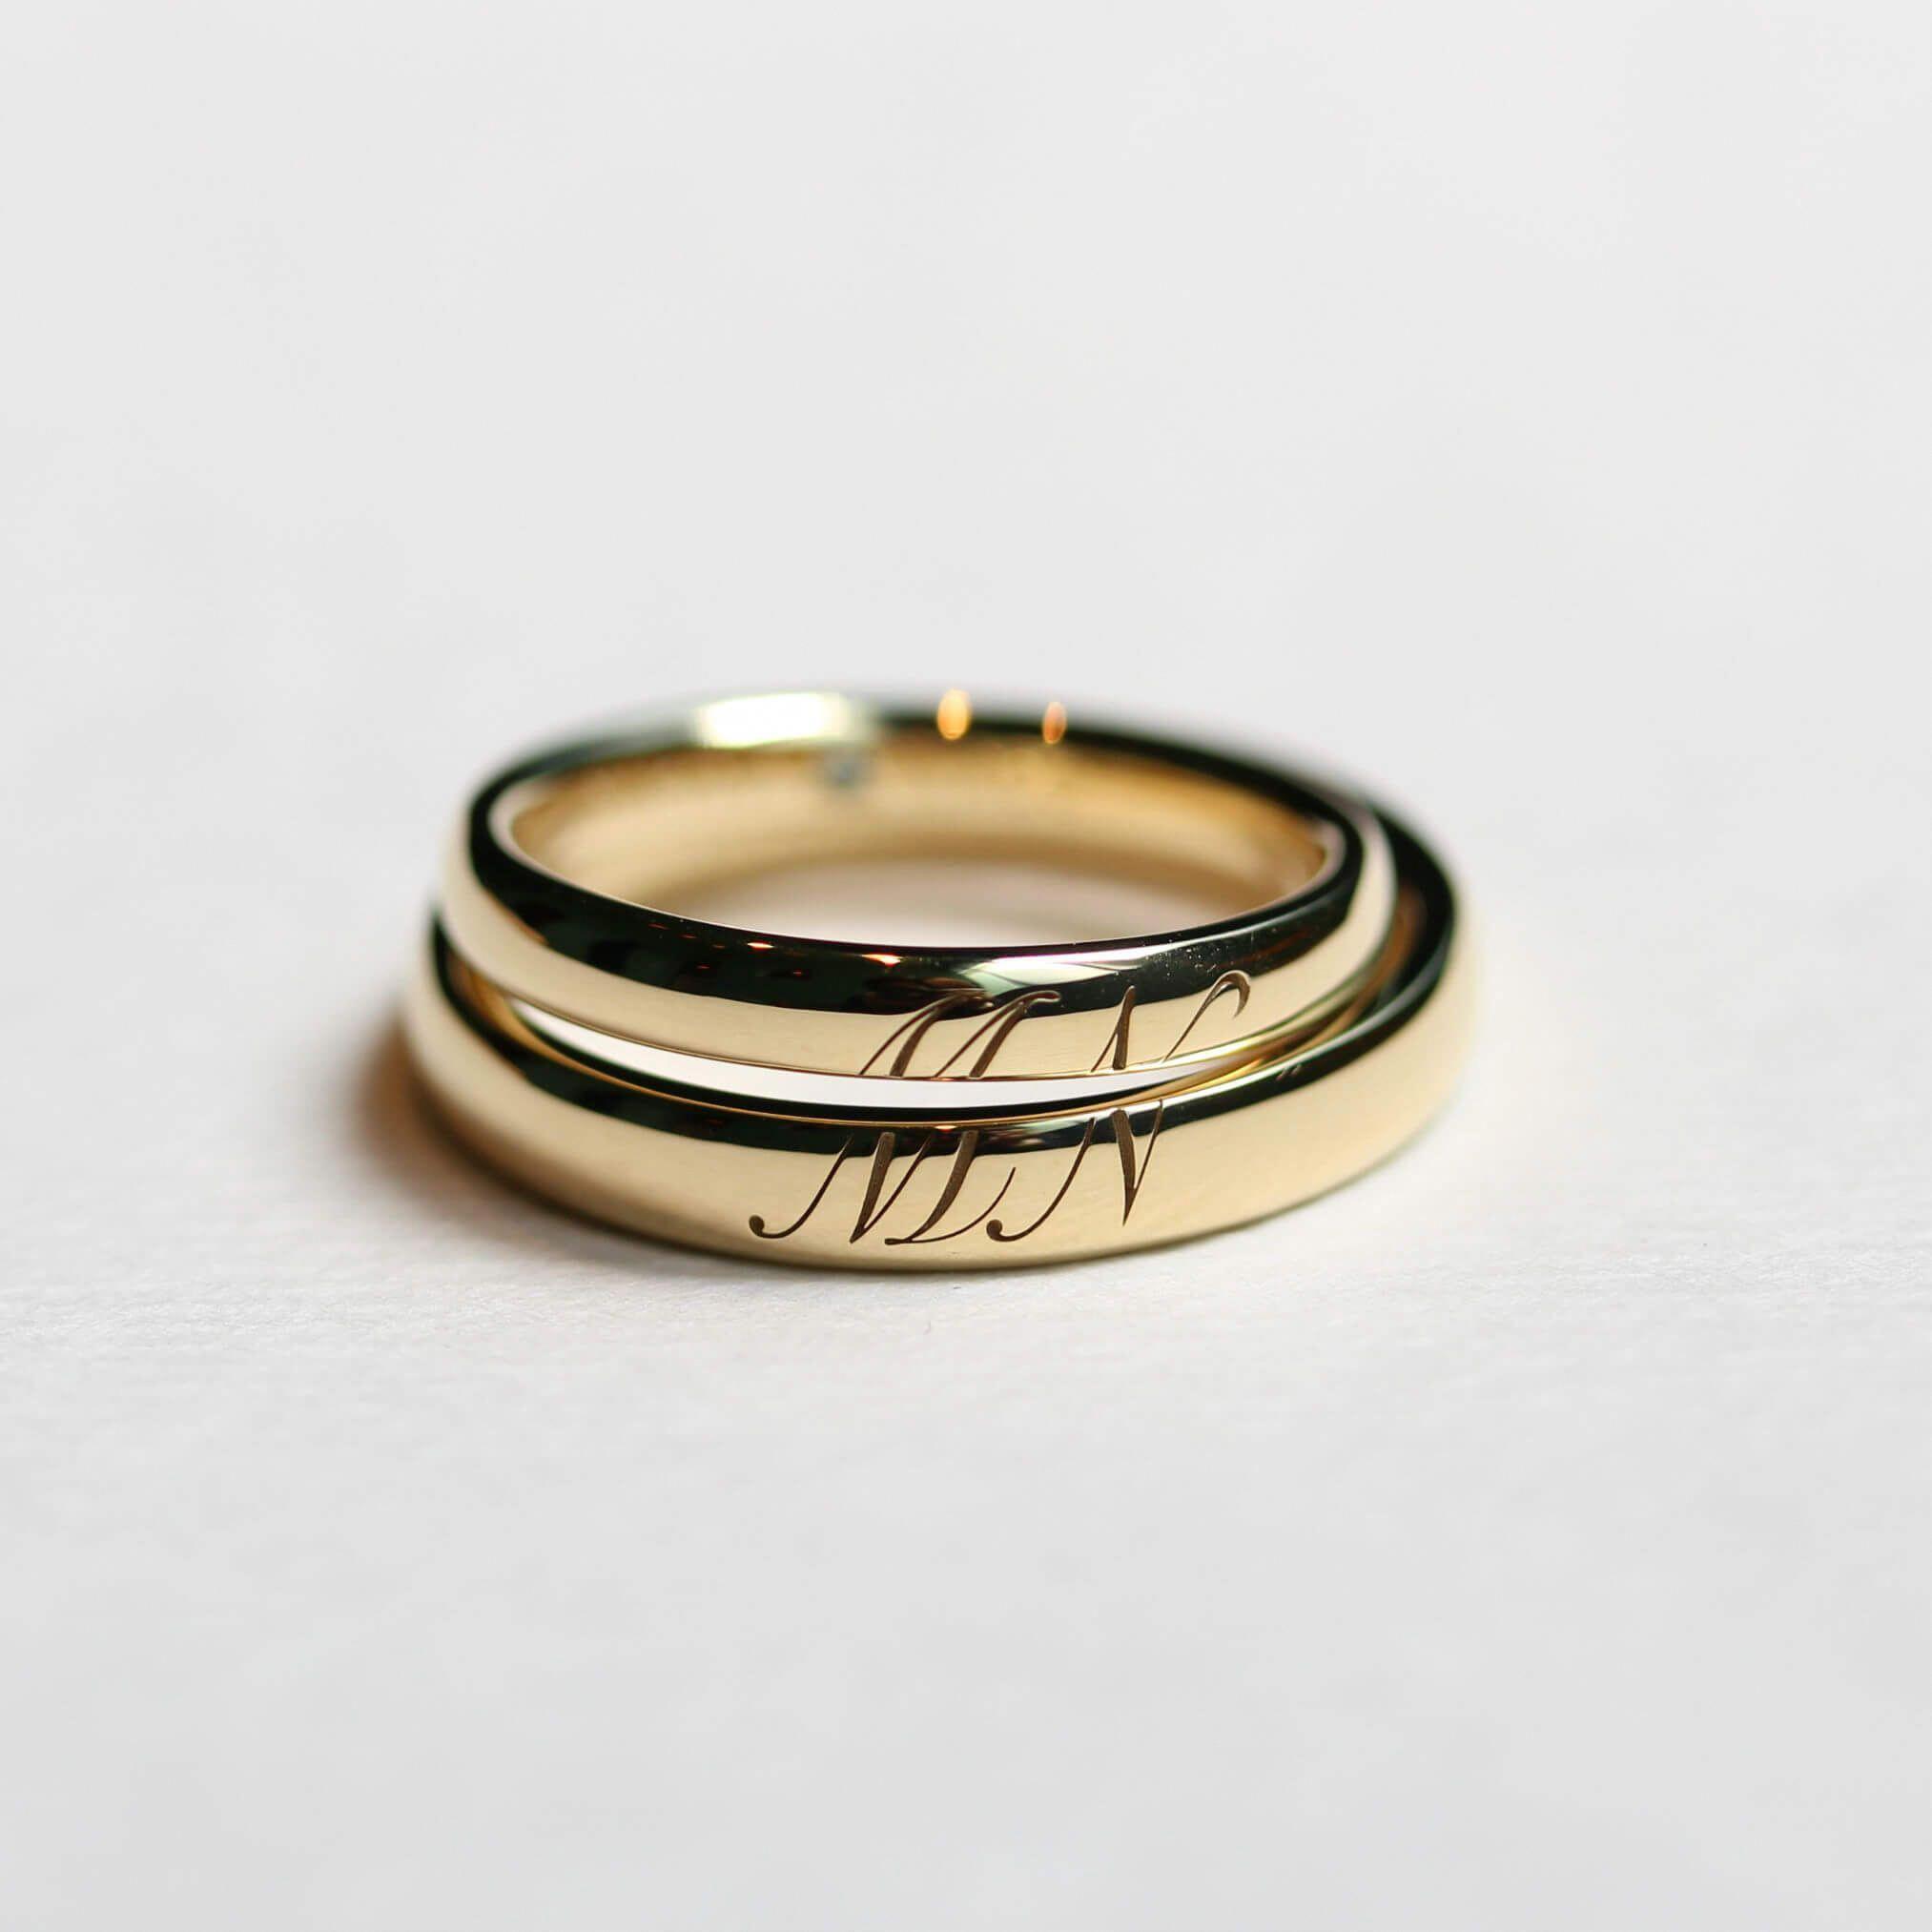 Engagement Rings Hobart: 14k Rose Gold Round 7mm Mortganite Solitaire Bezel